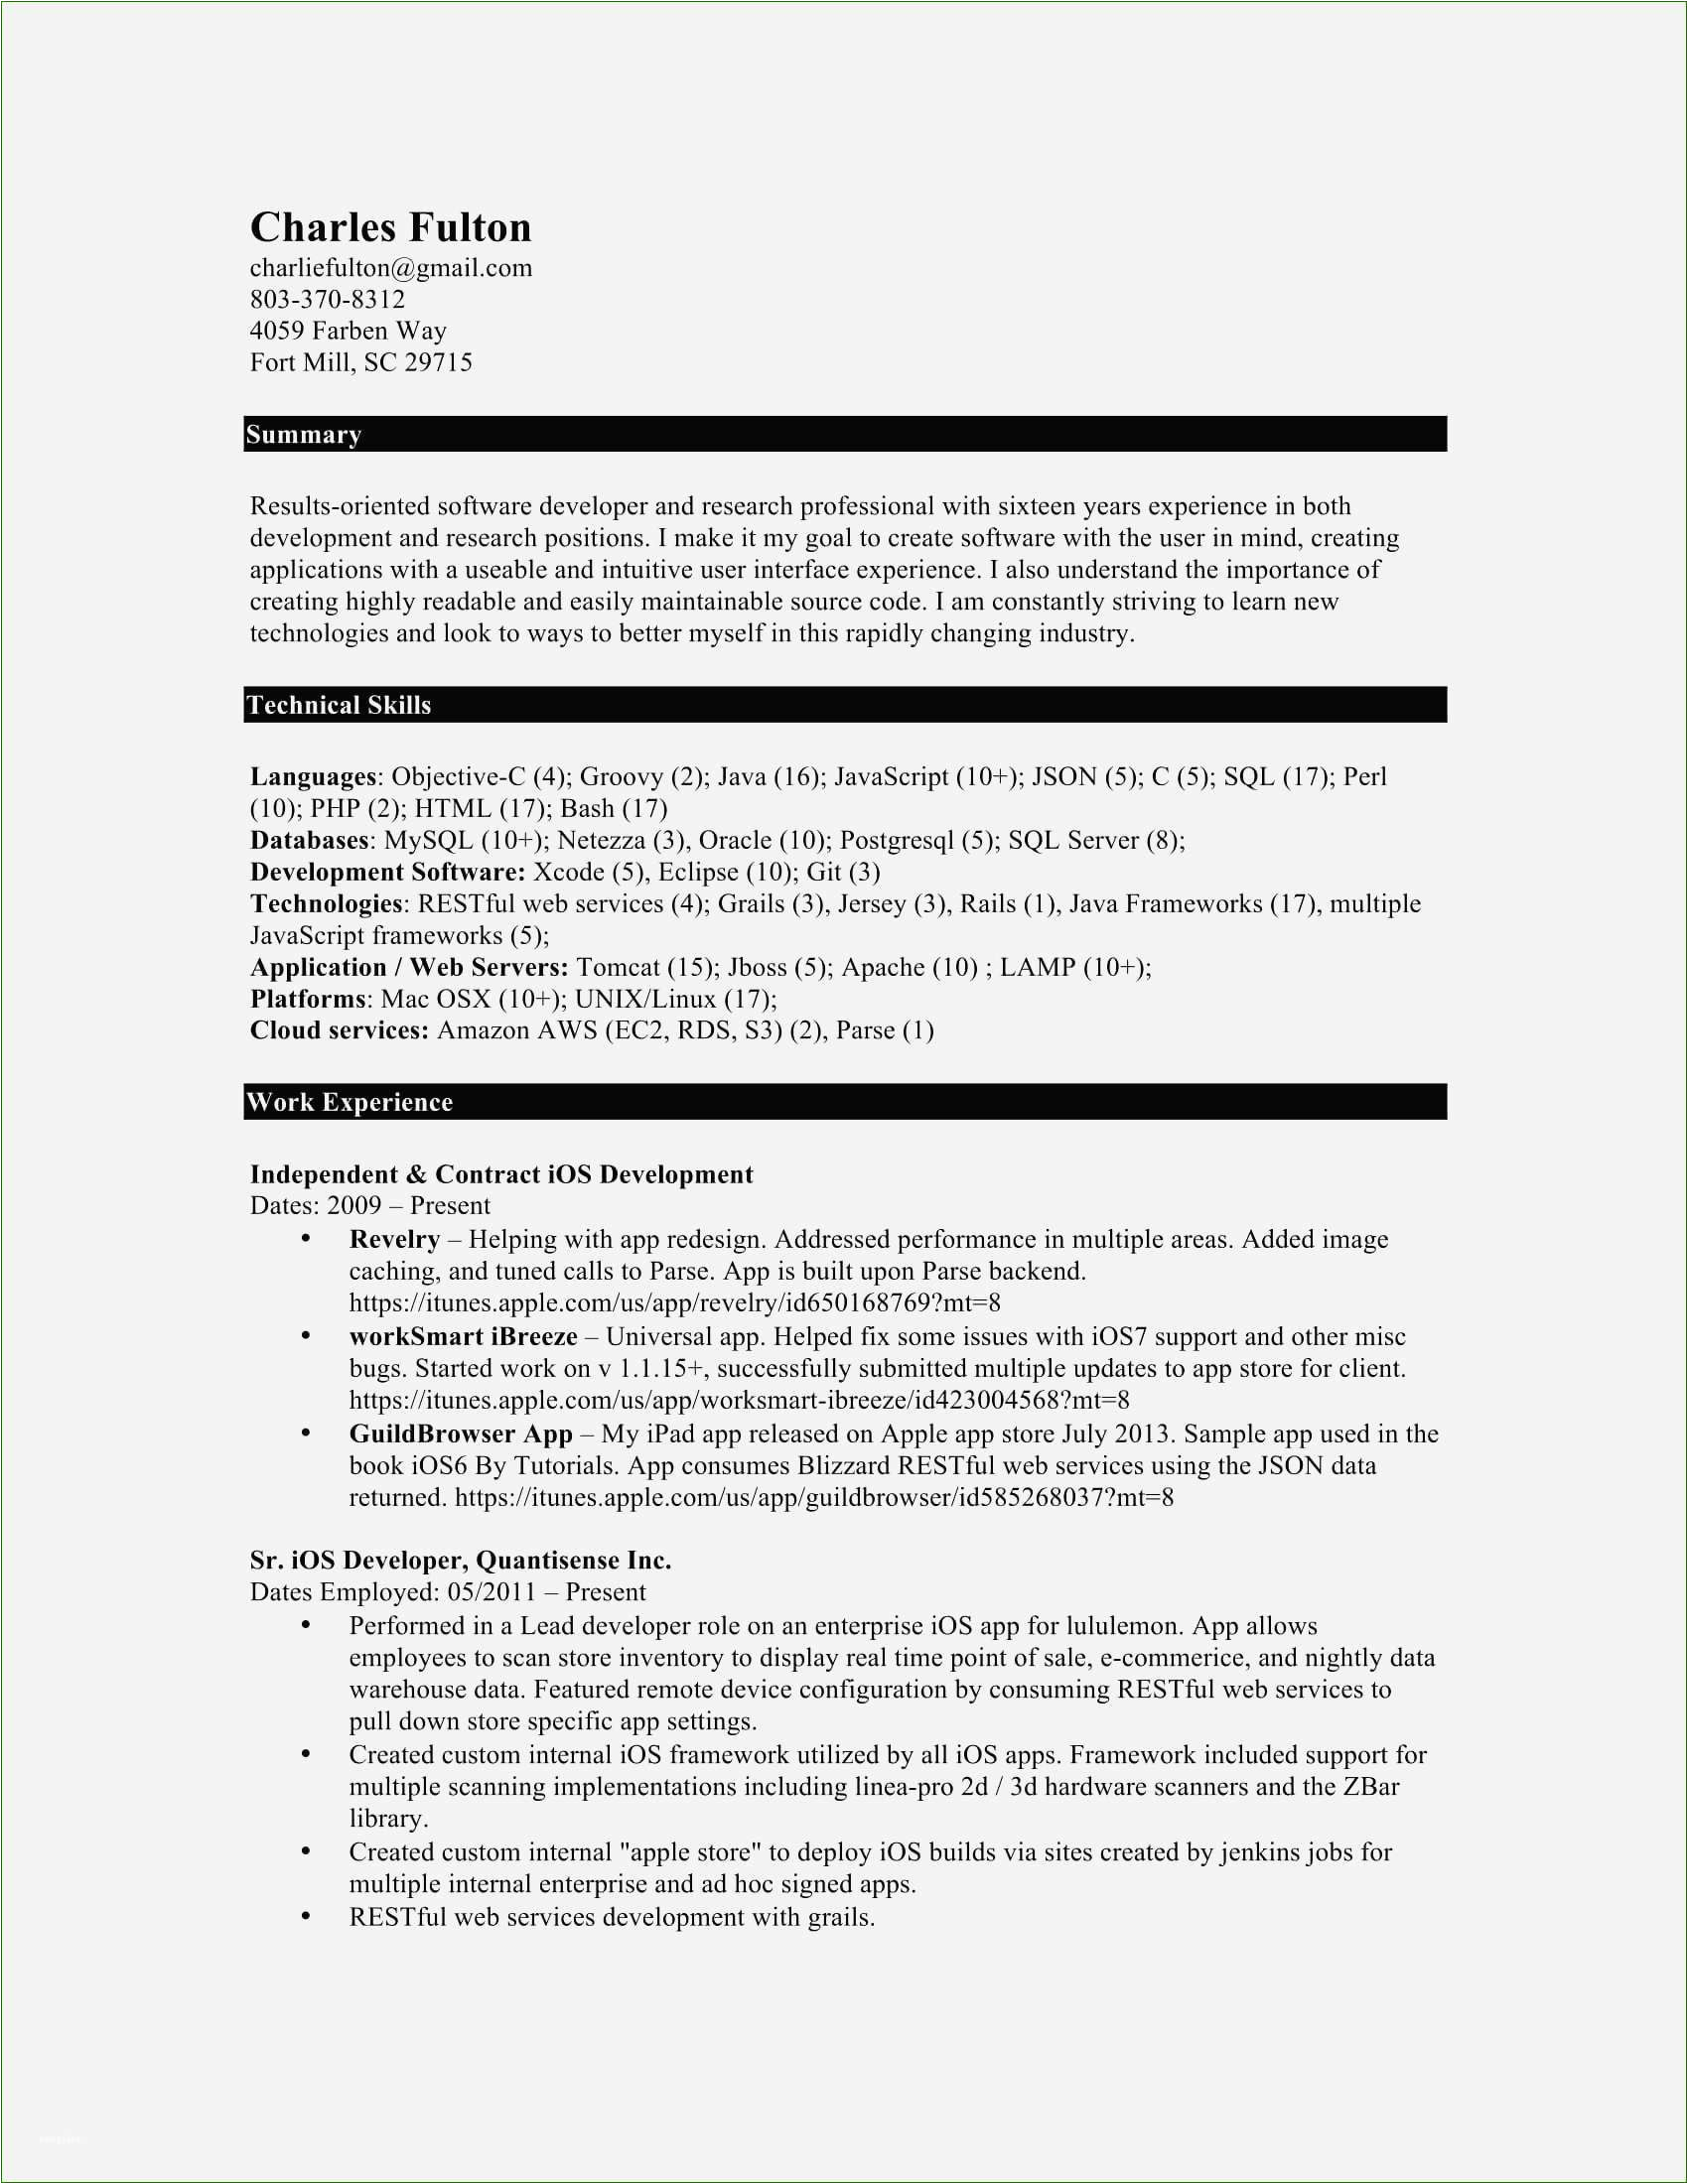 10 years experience software engineer resume